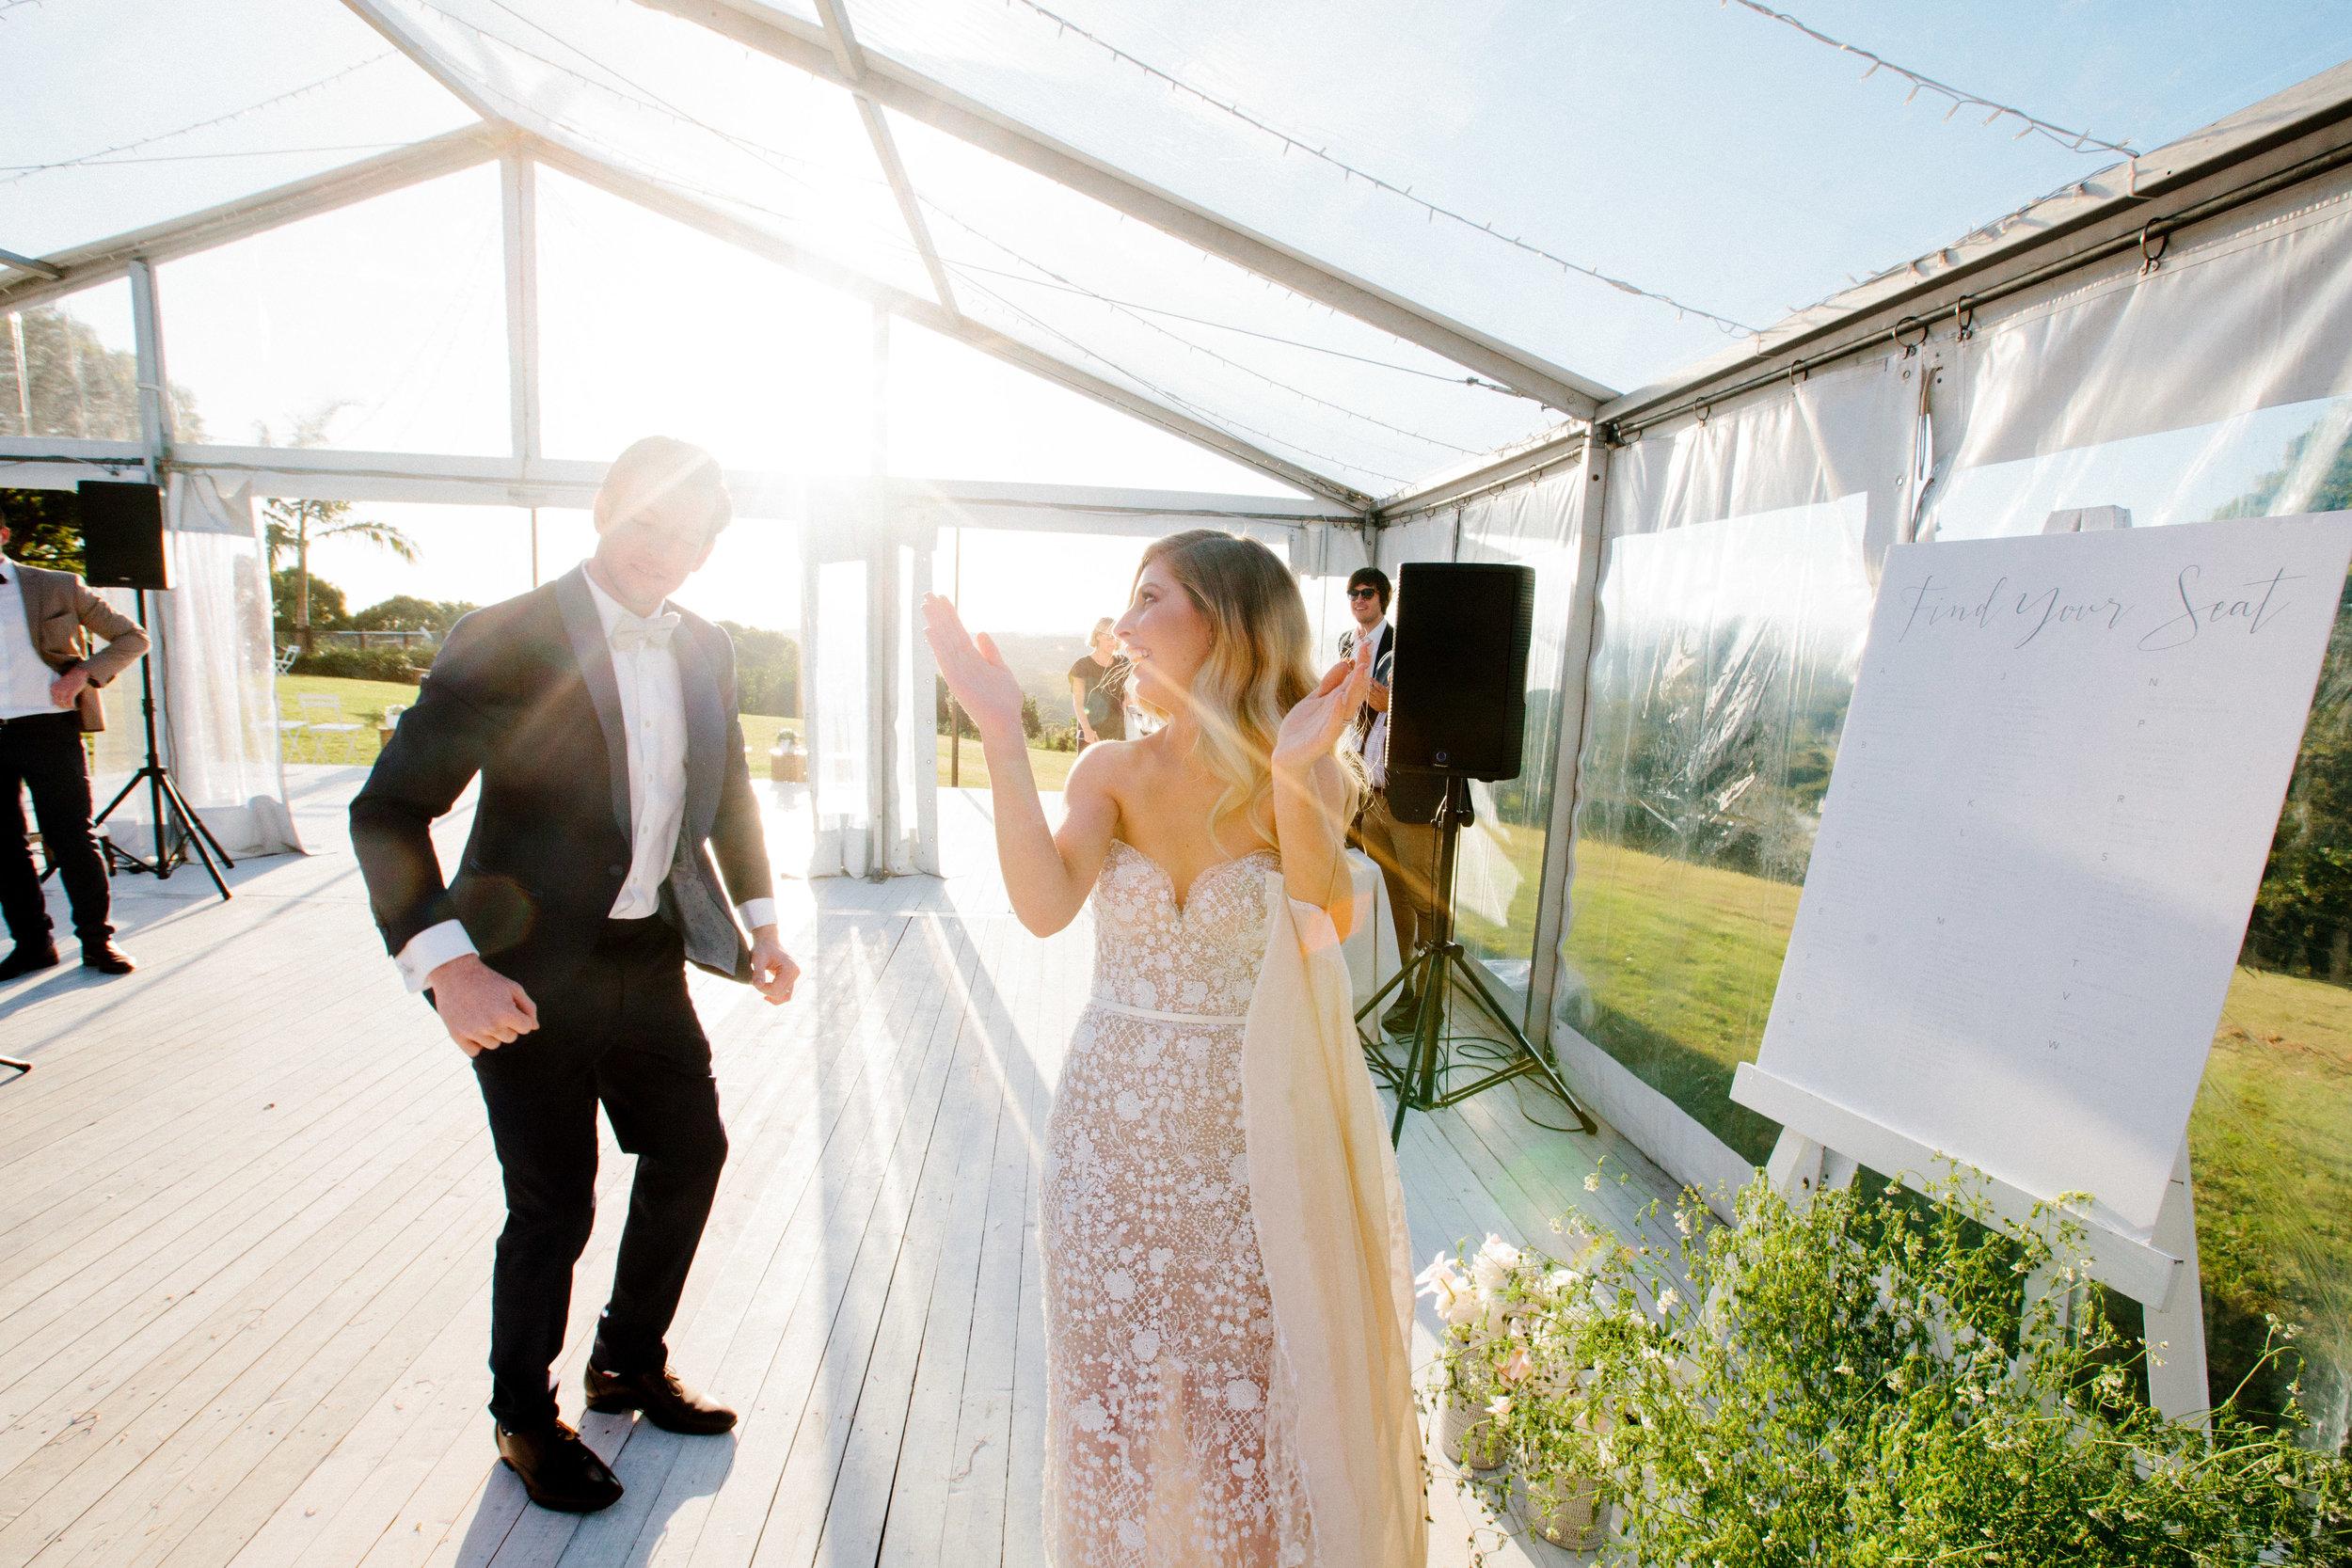 Hampton Event Hire - Wedding and Event Hire | Cedia House Byron Bay Wedding - Carla + Matt | www.hamptoneventhire.com | Photo by Brooke Adams Photography